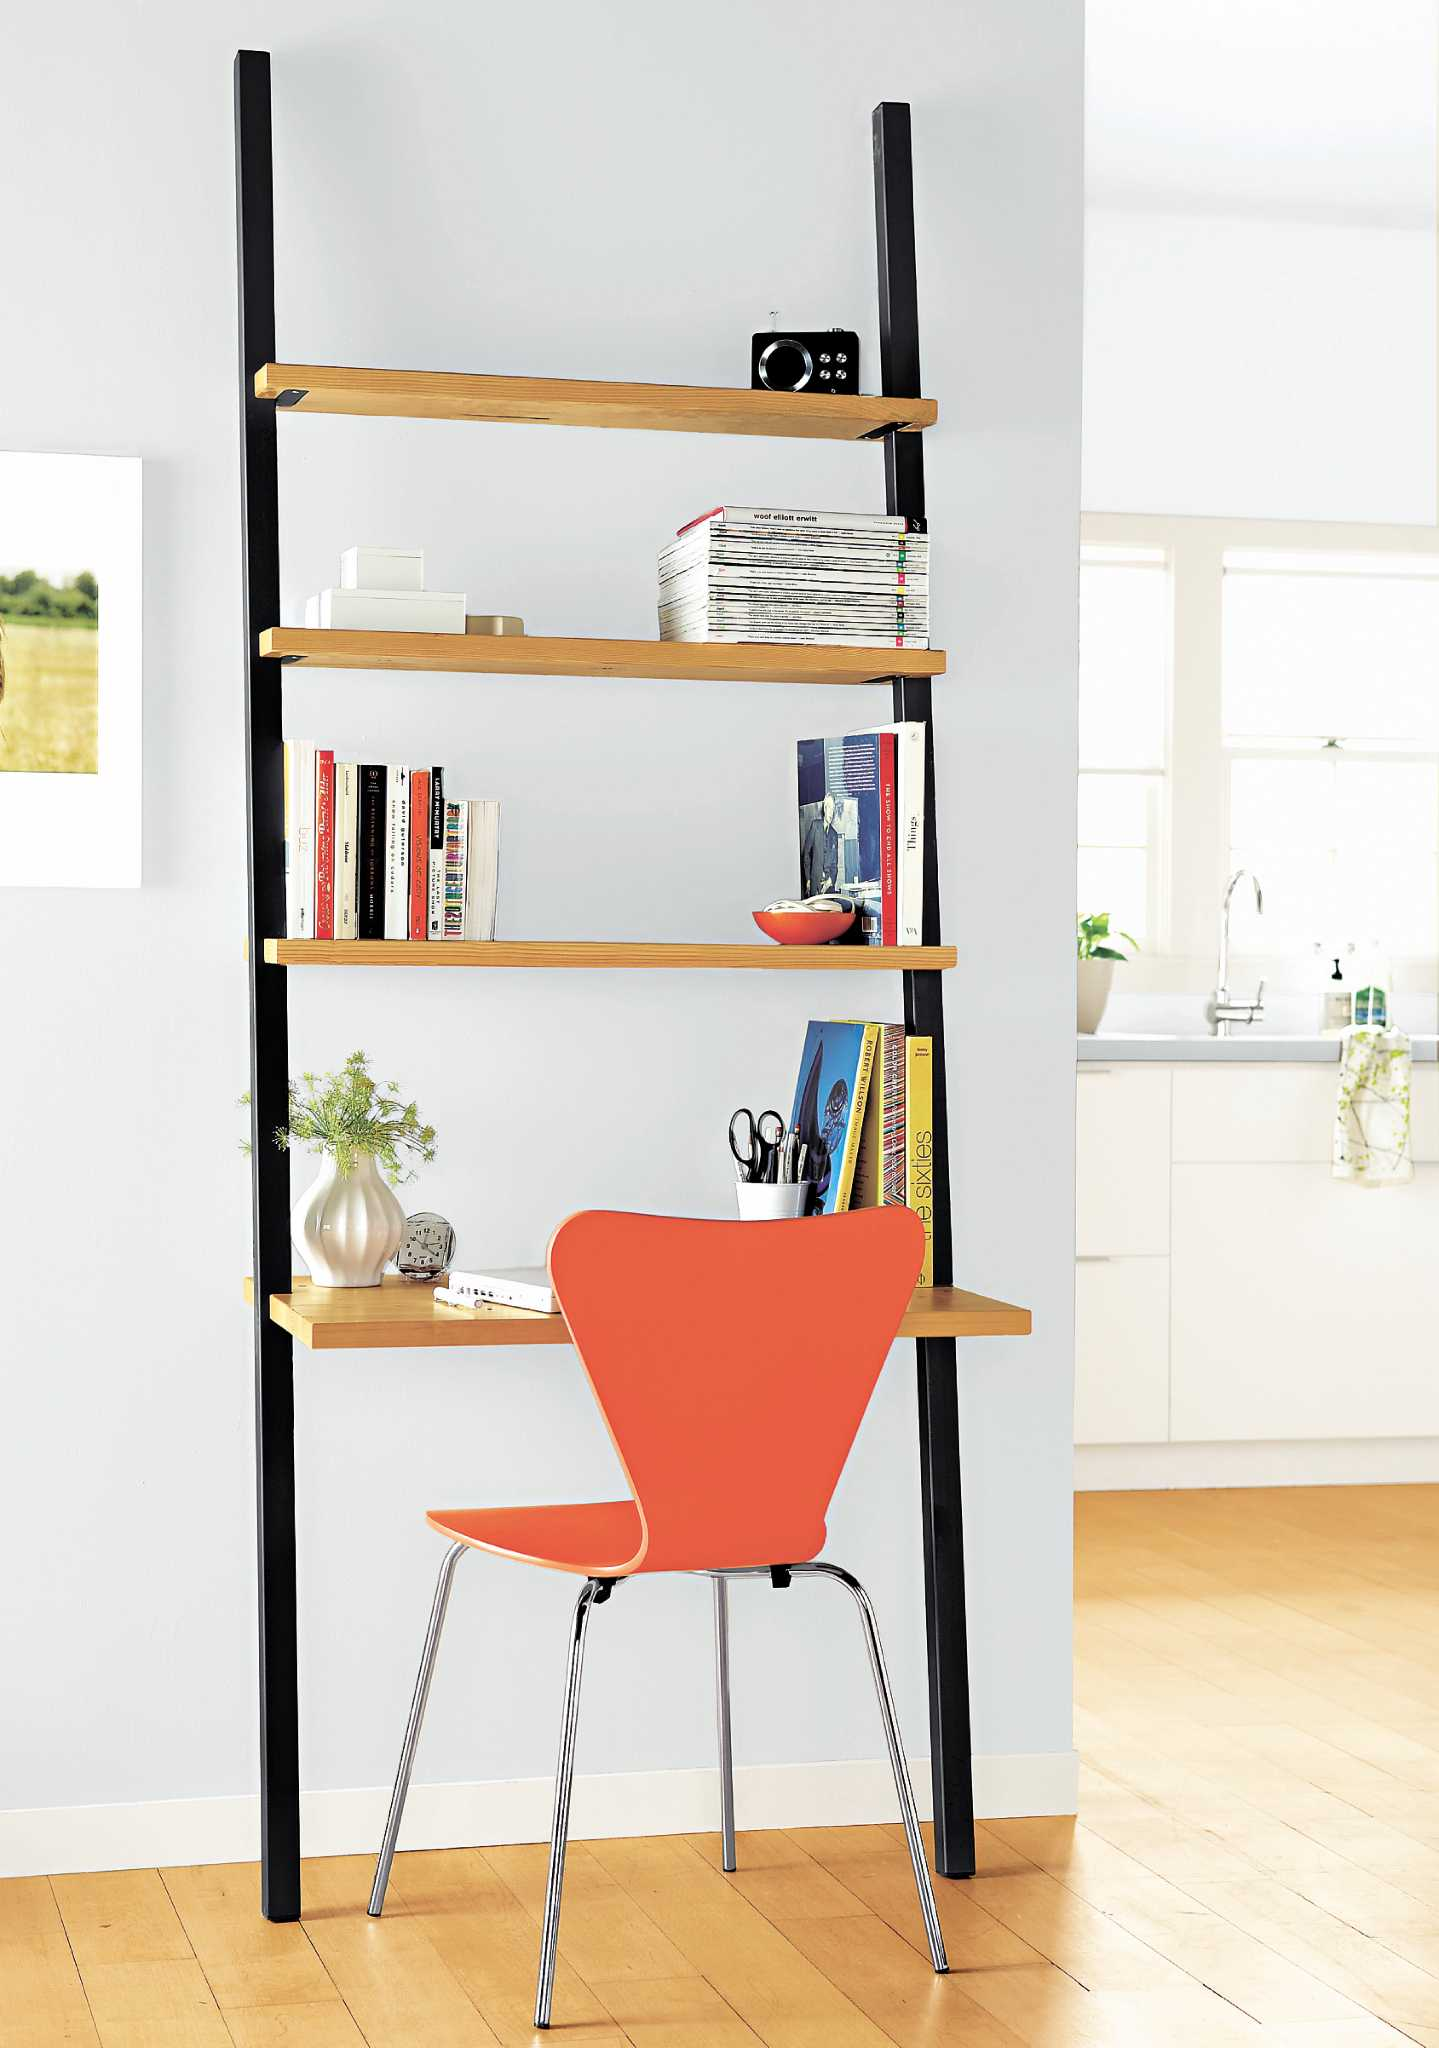 Minimalist Desks Simply Get The Job Done